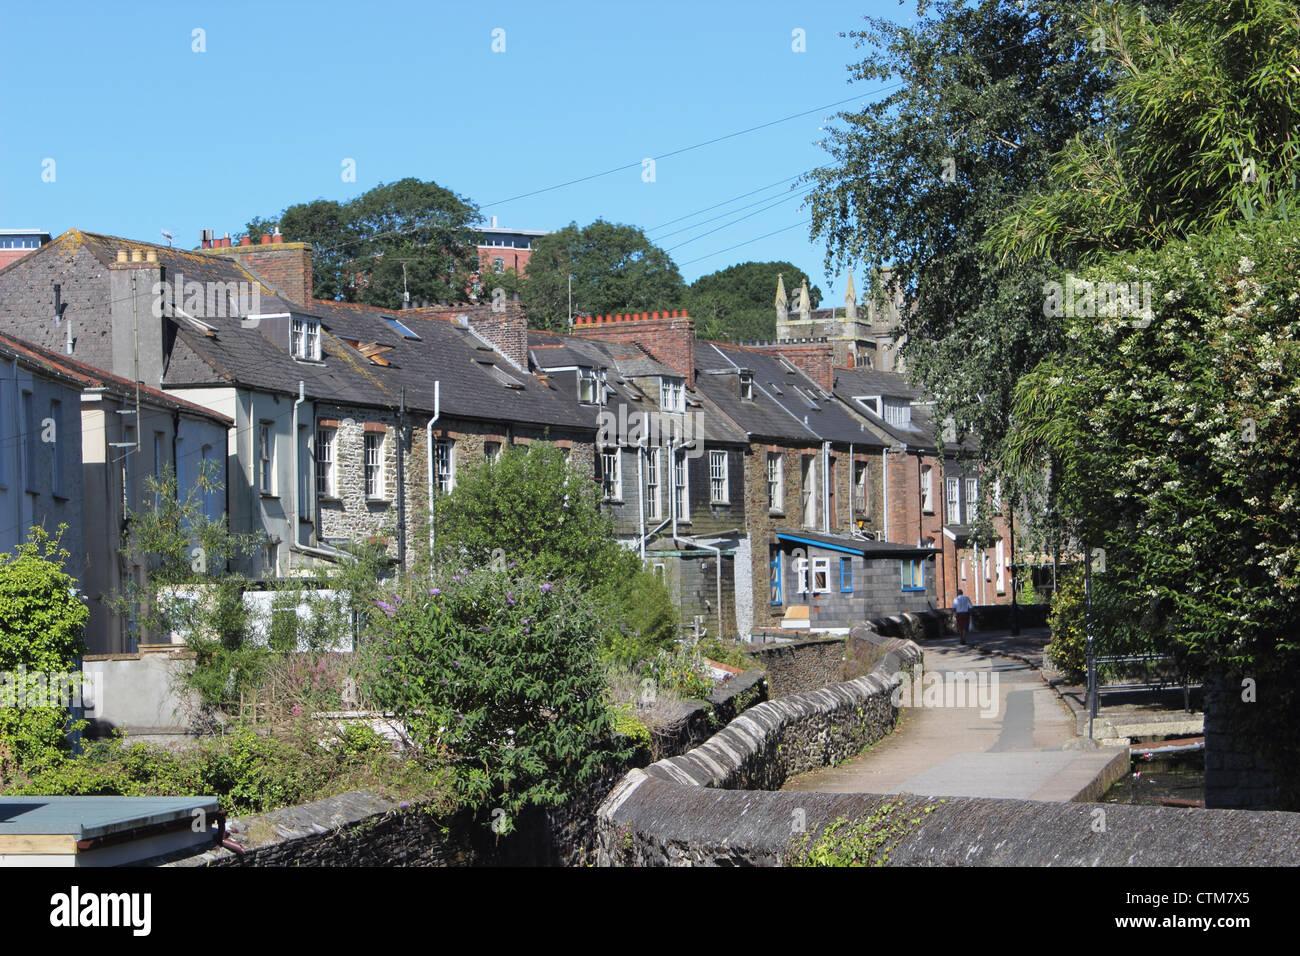 The Leats Truro Cornwall UK - Stock Image